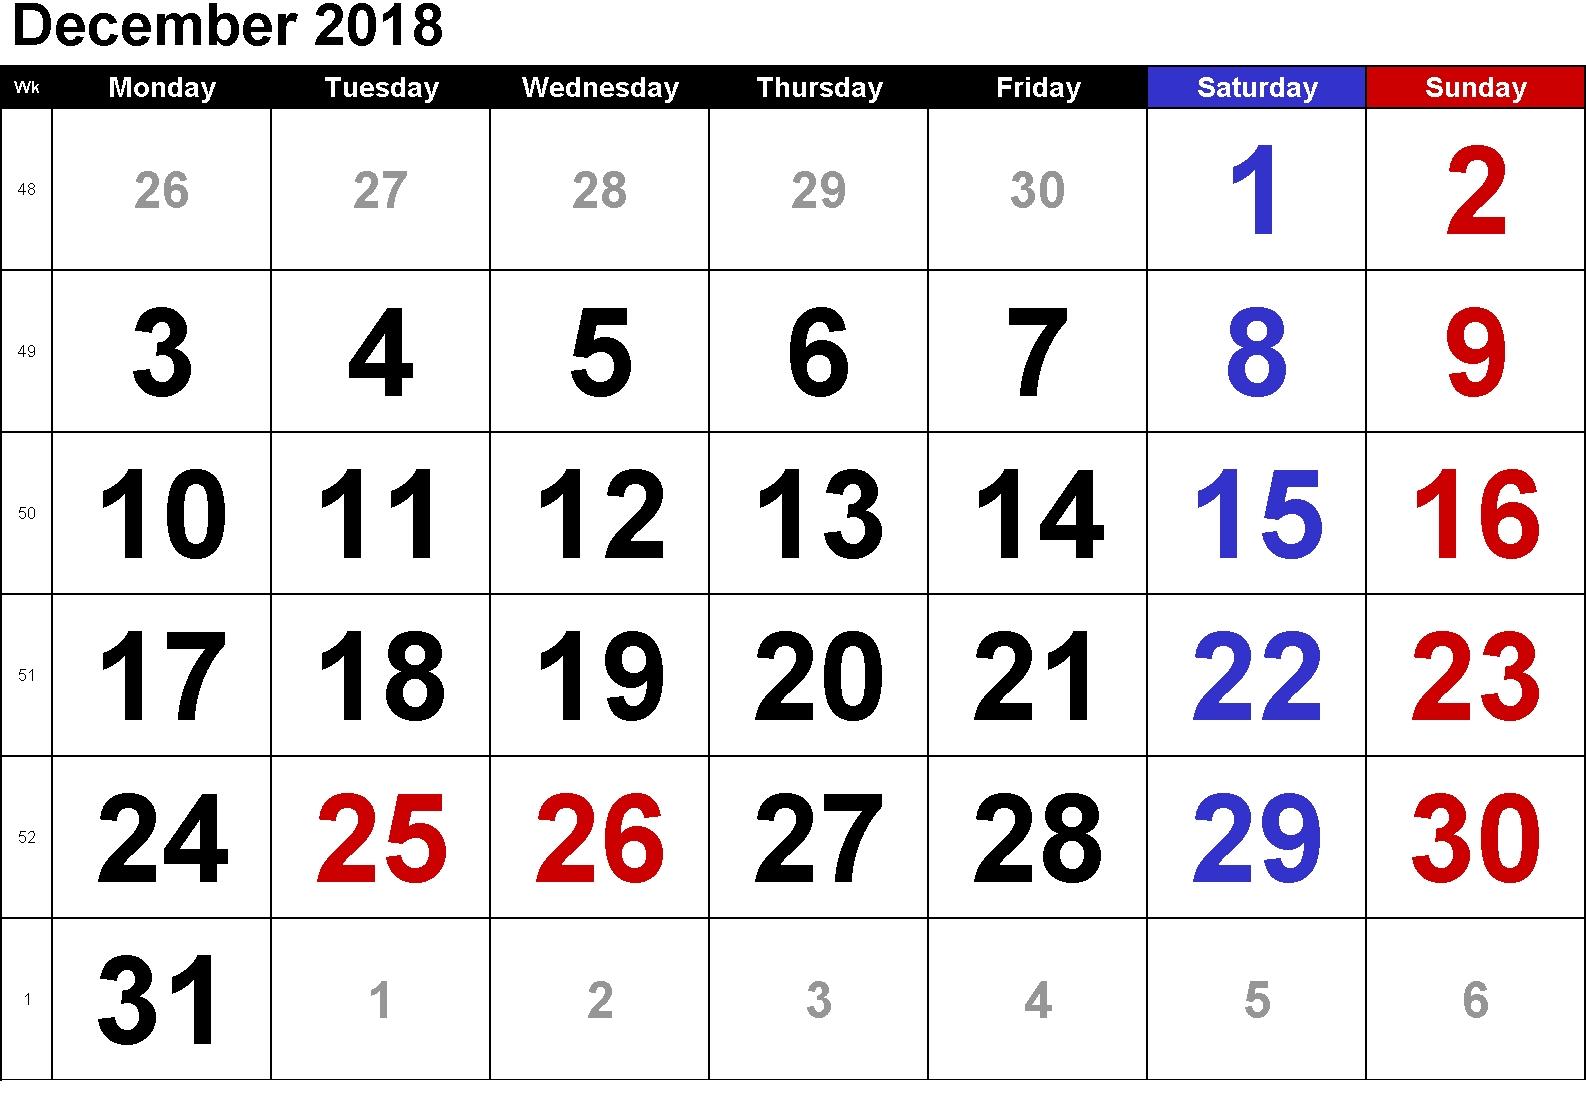 get free 2018 december calendar printable templates november 2018::December 2018 Calendar Printable Template